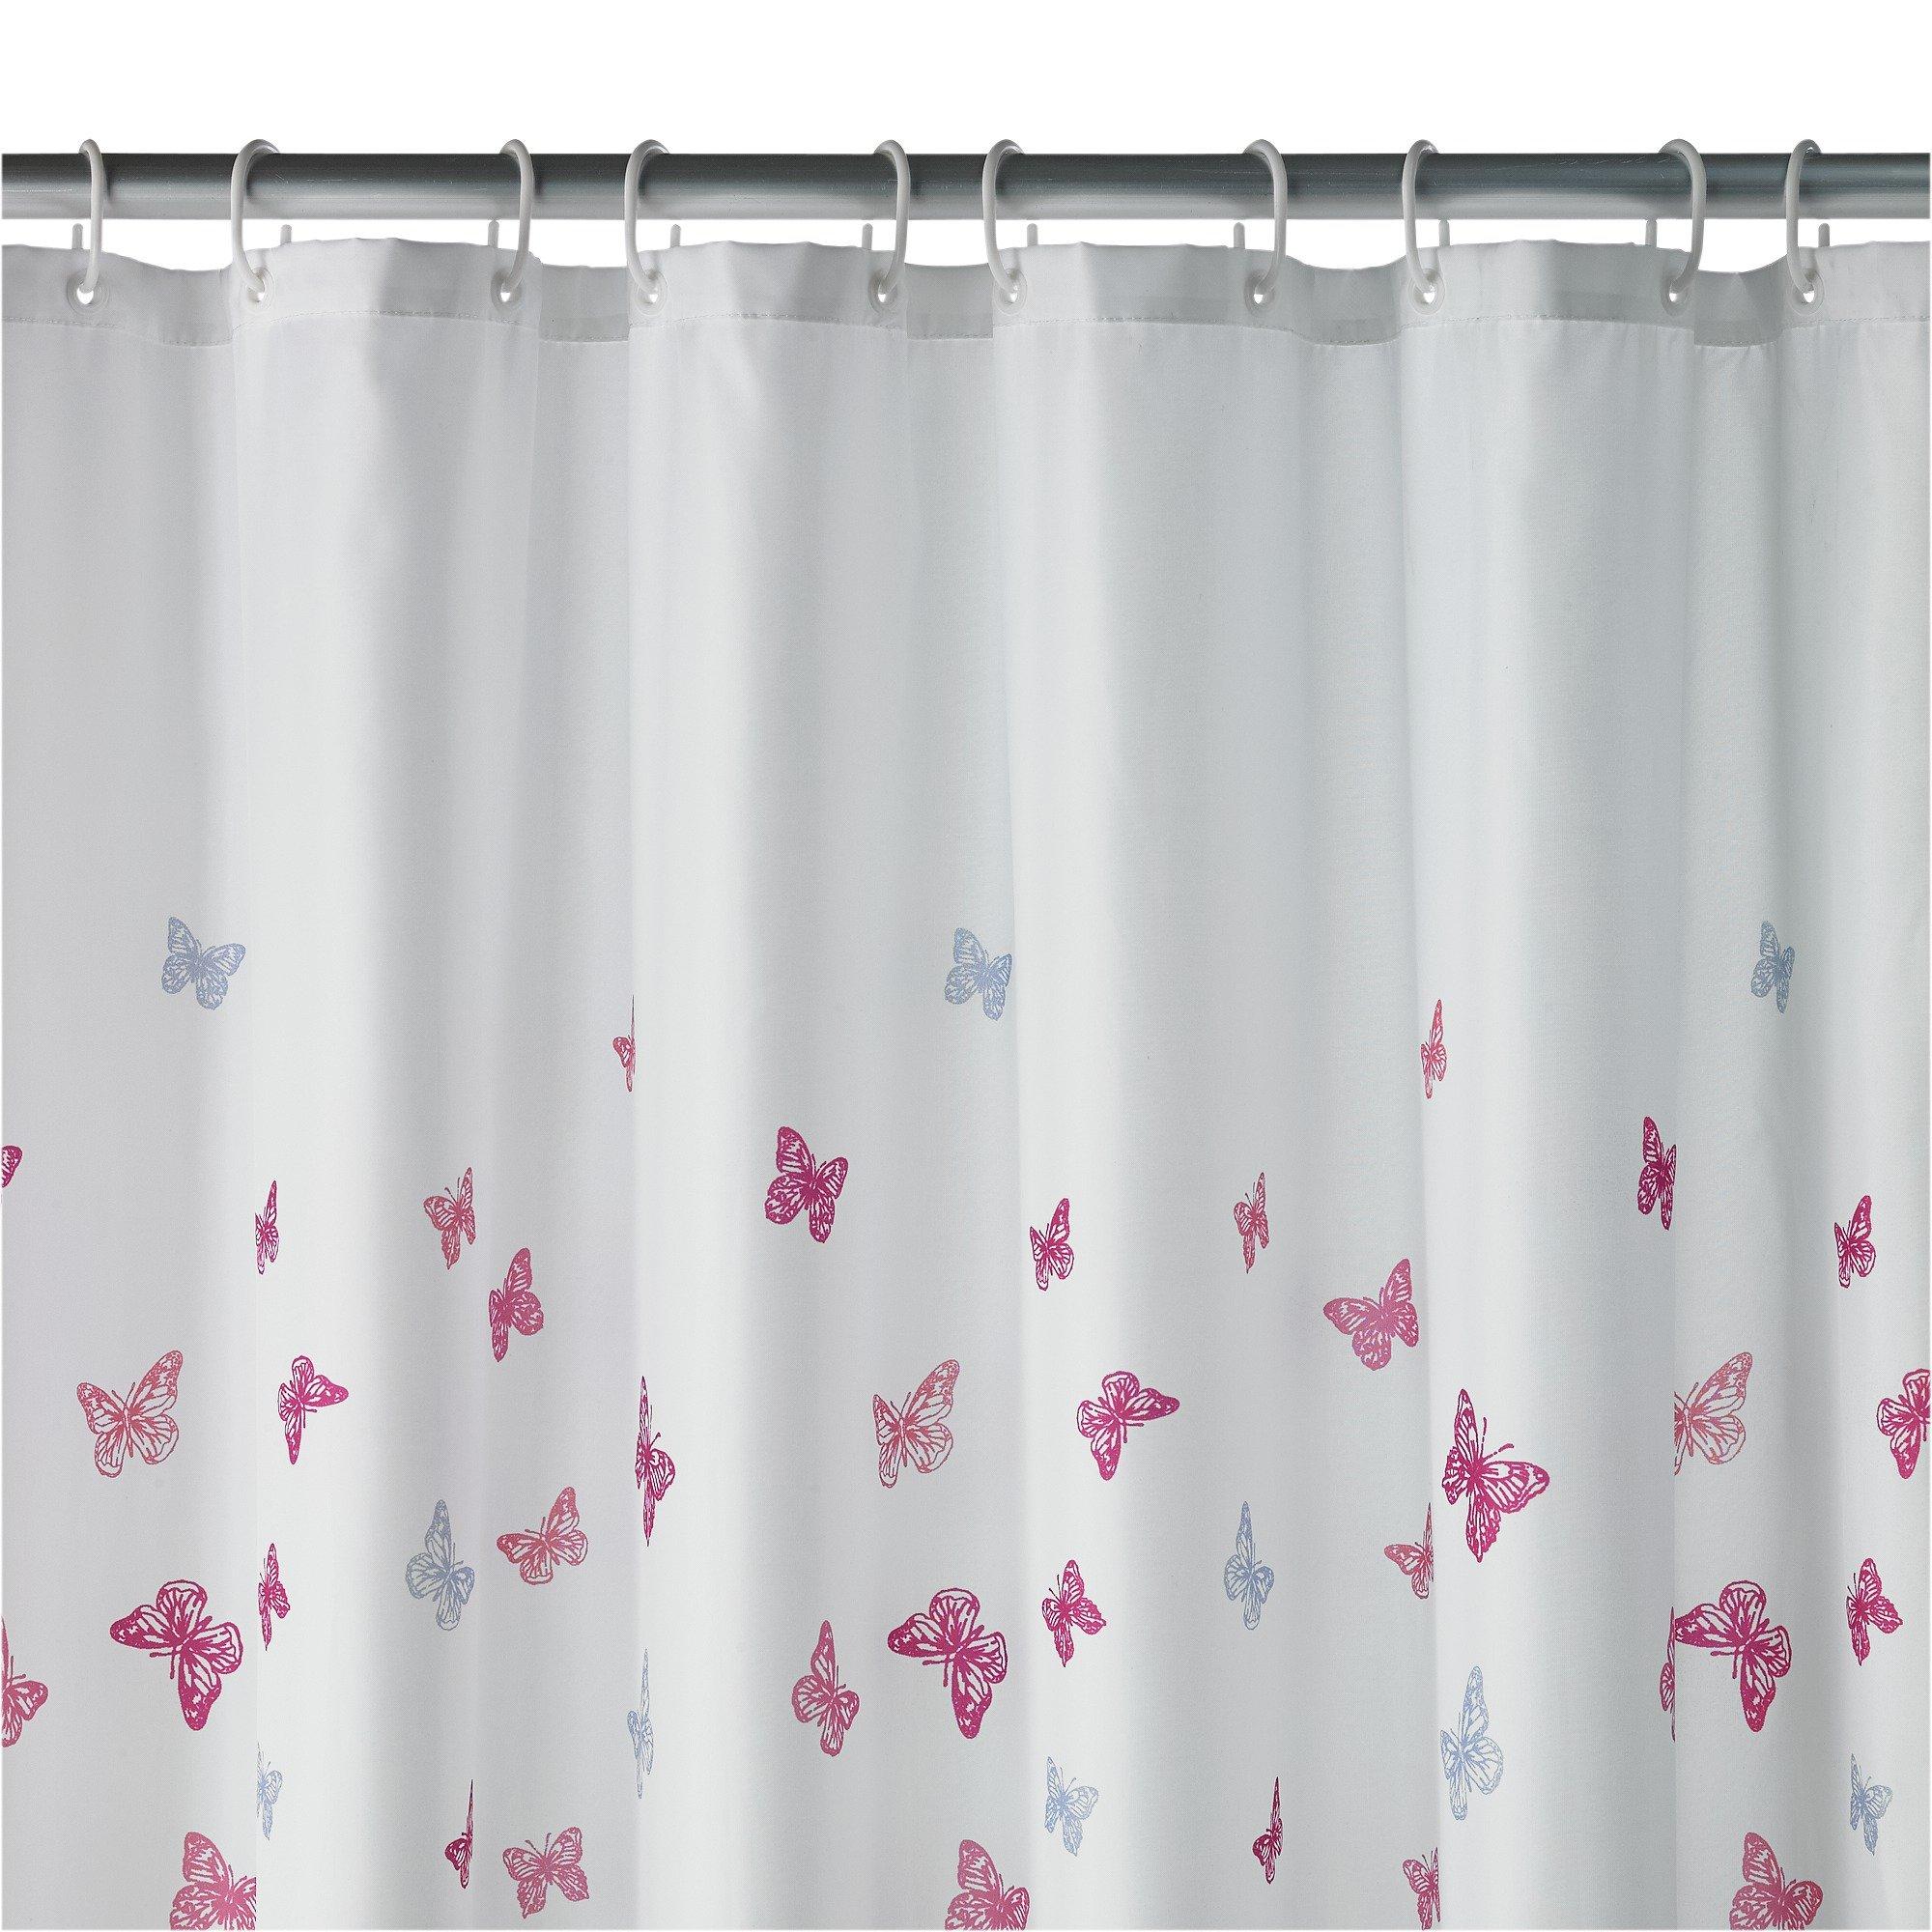 home butterfly scatter shower curtain. Black Bedroom Furniture Sets. Home Design Ideas